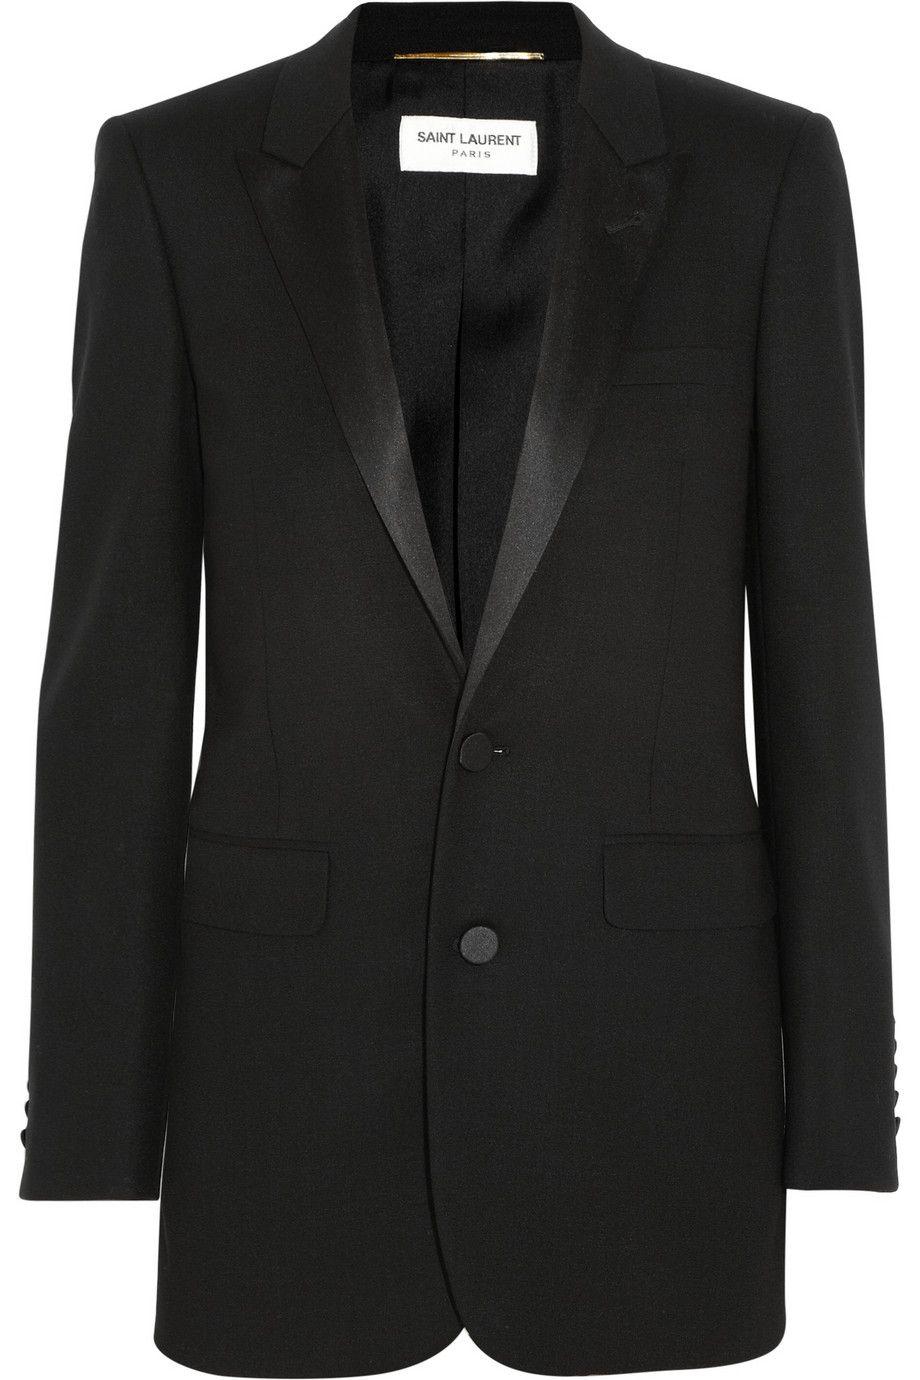 b84bce80611 Black grain de poudre wool jacket. Saint Laurent created the iconic 'Le  Smoking' tuxedo in 1966. Hedi Slimane's contemporary update on the blazer  has ...